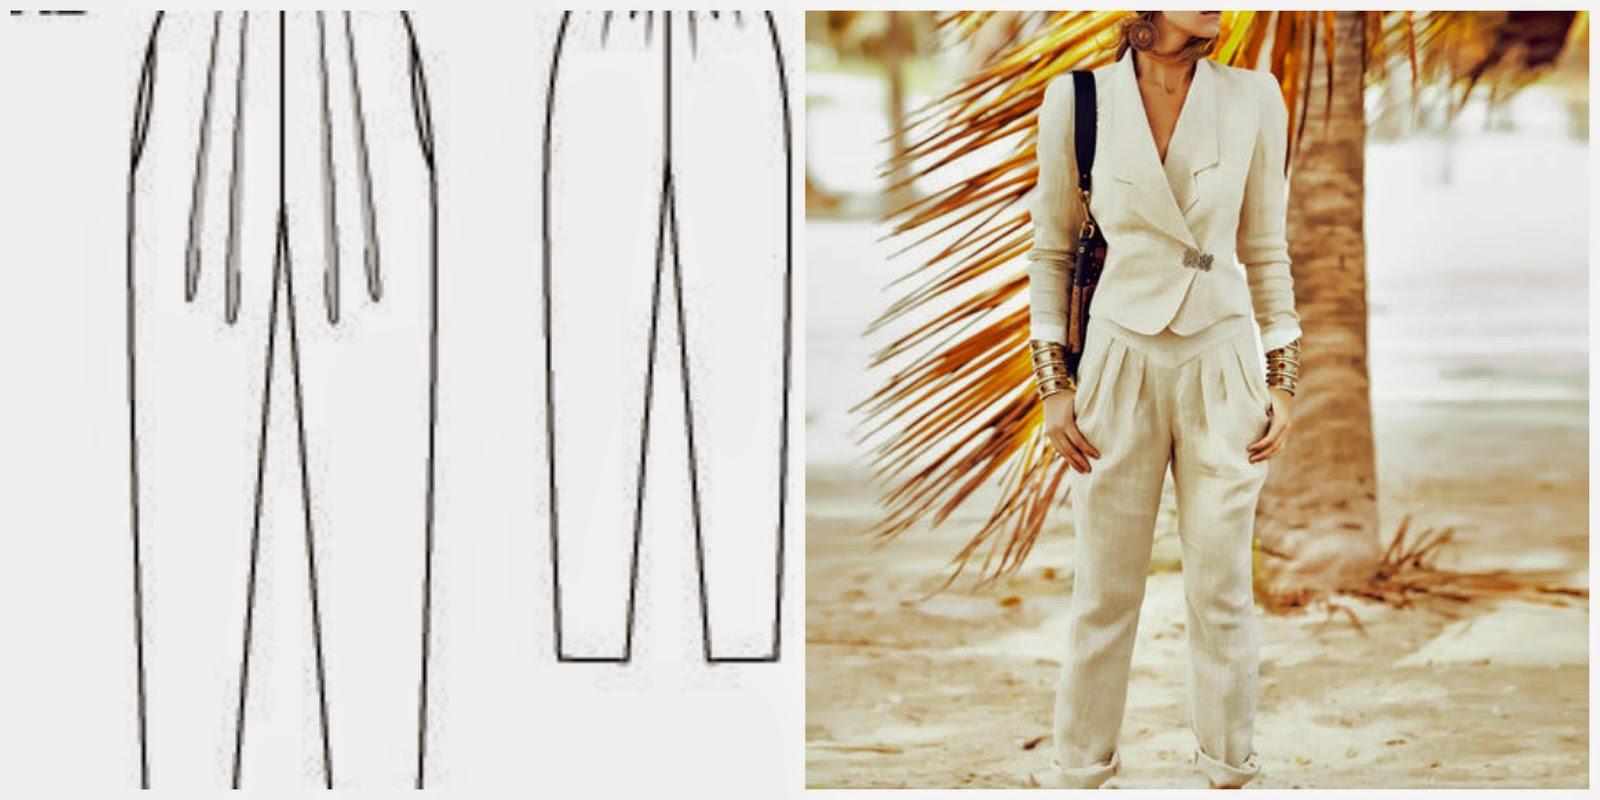 pantalones pinzas burda pants 110 04/2014 abril modistilla de pacotilla handmade